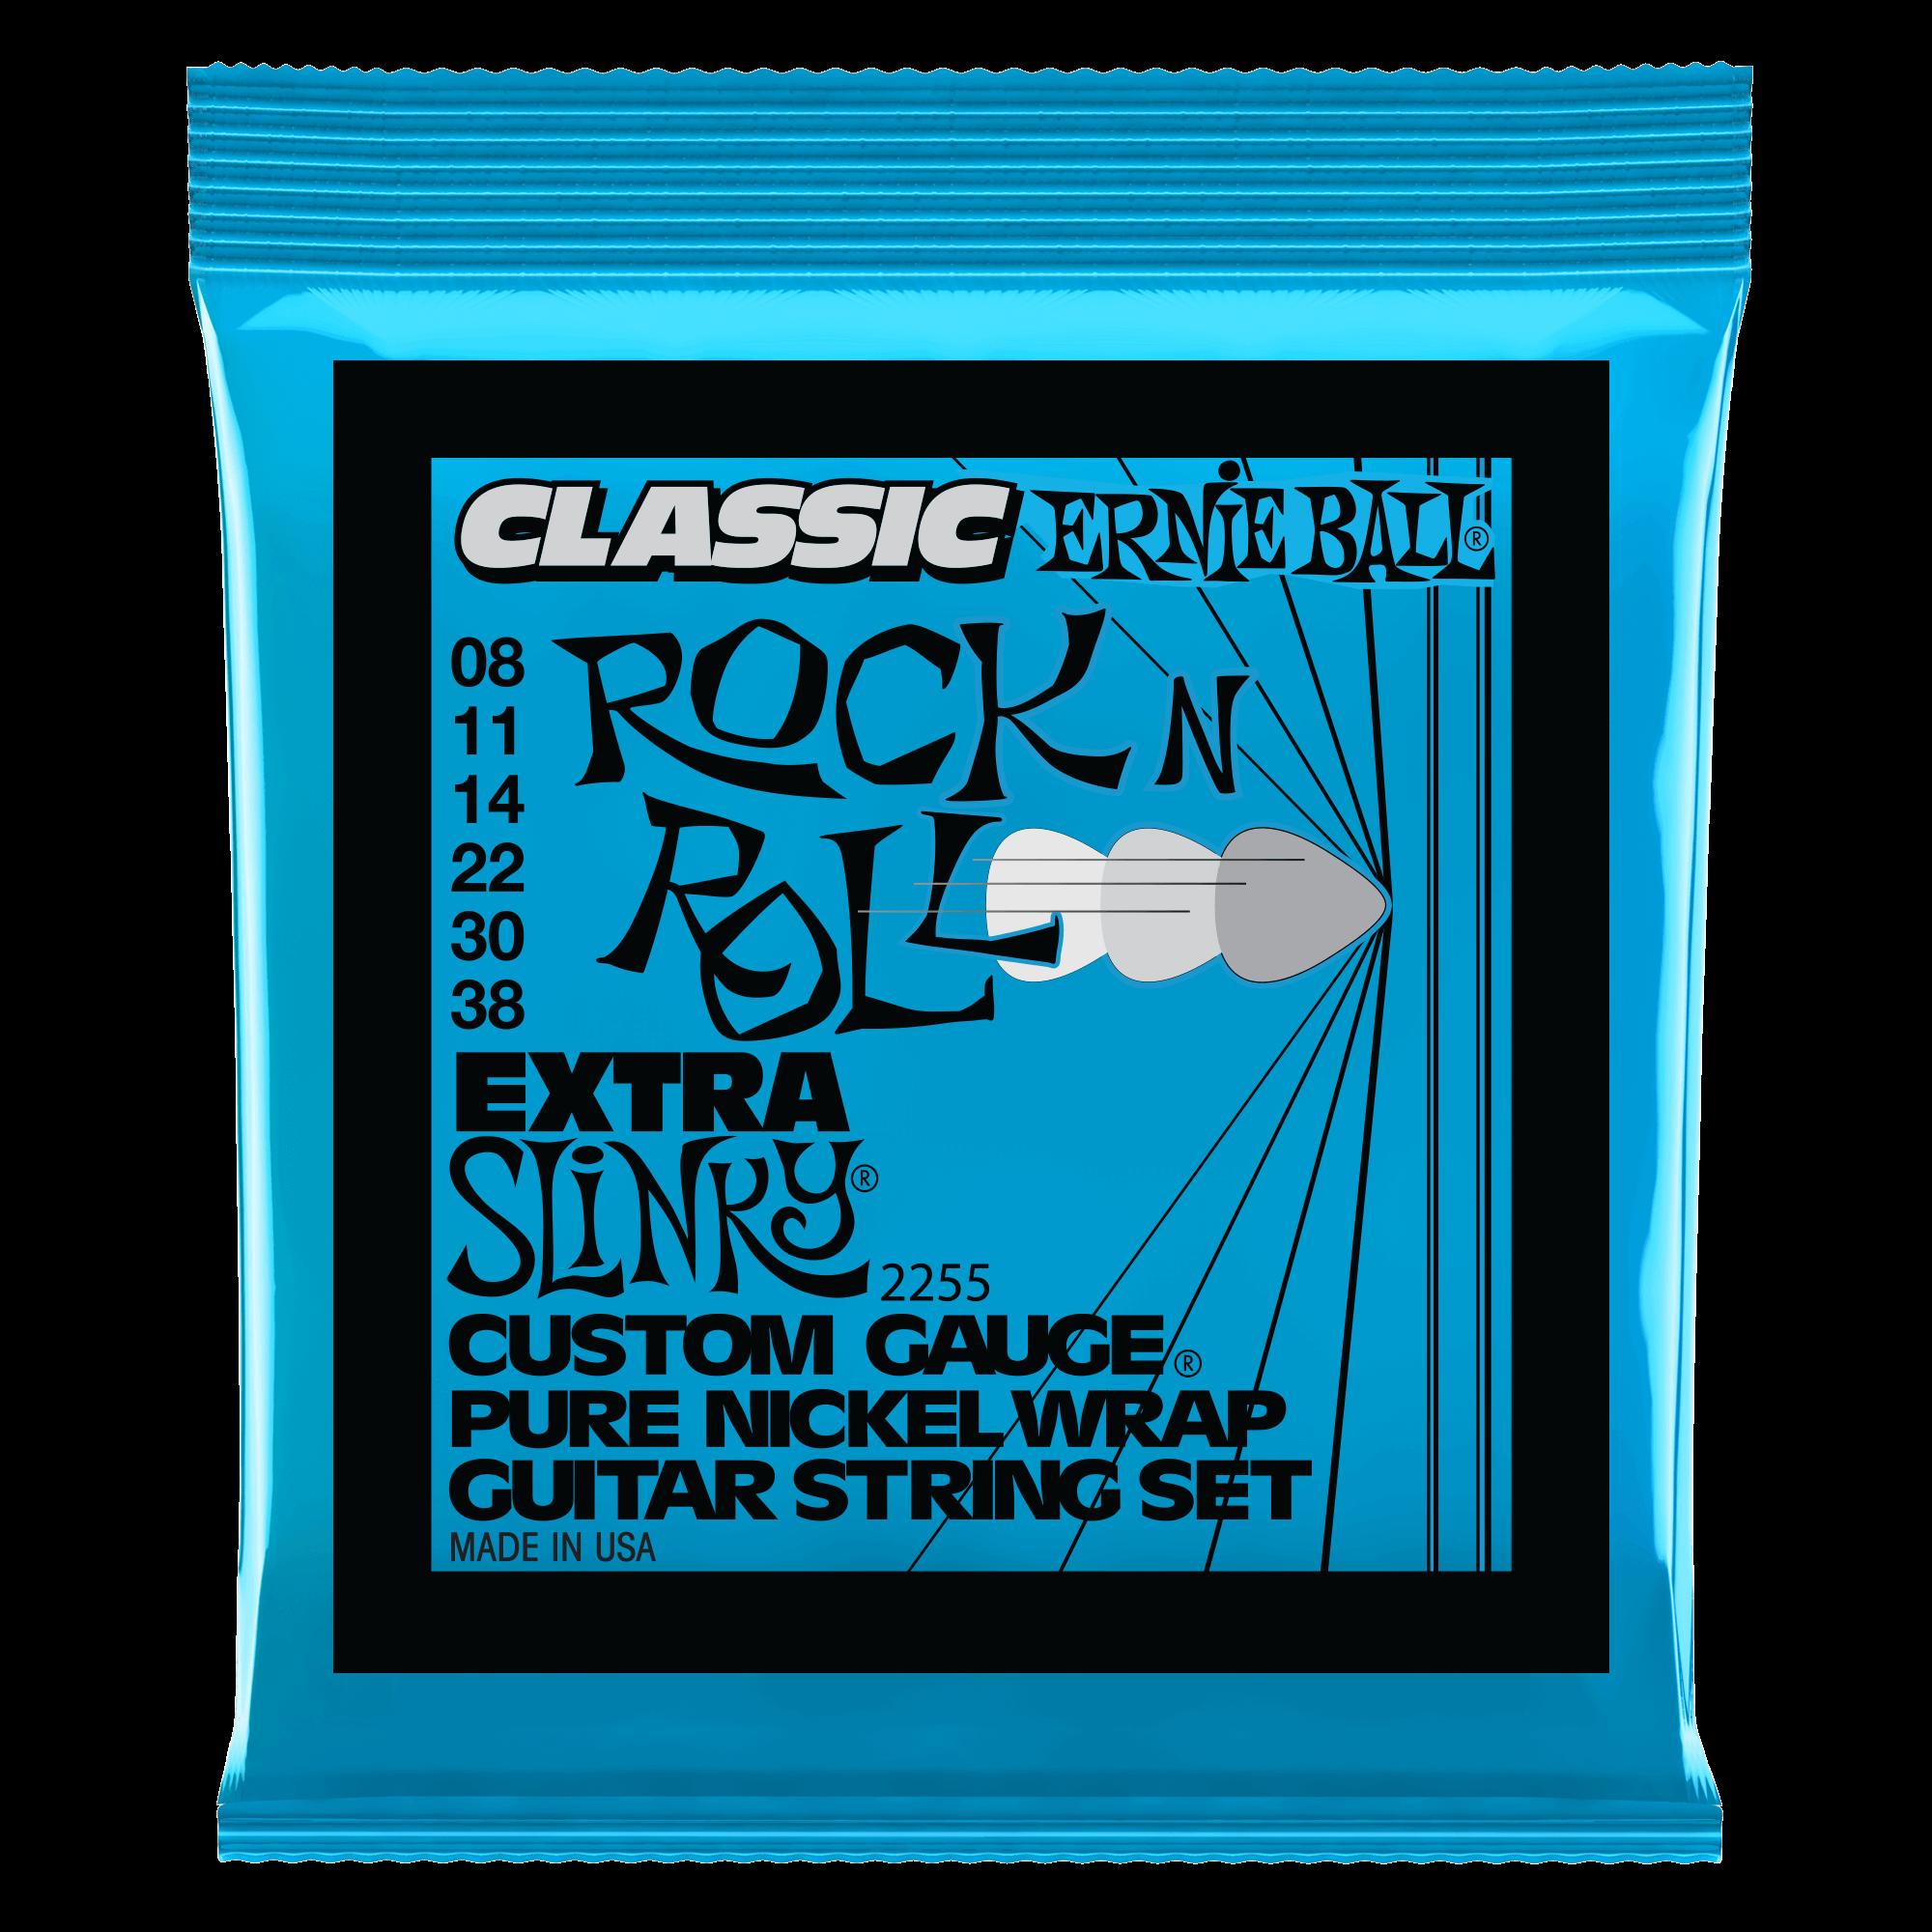 slinky classic rock n roll pure nickel wrap electric guitar strings ernie ball. Black Bedroom Furniture Sets. Home Design Ideas